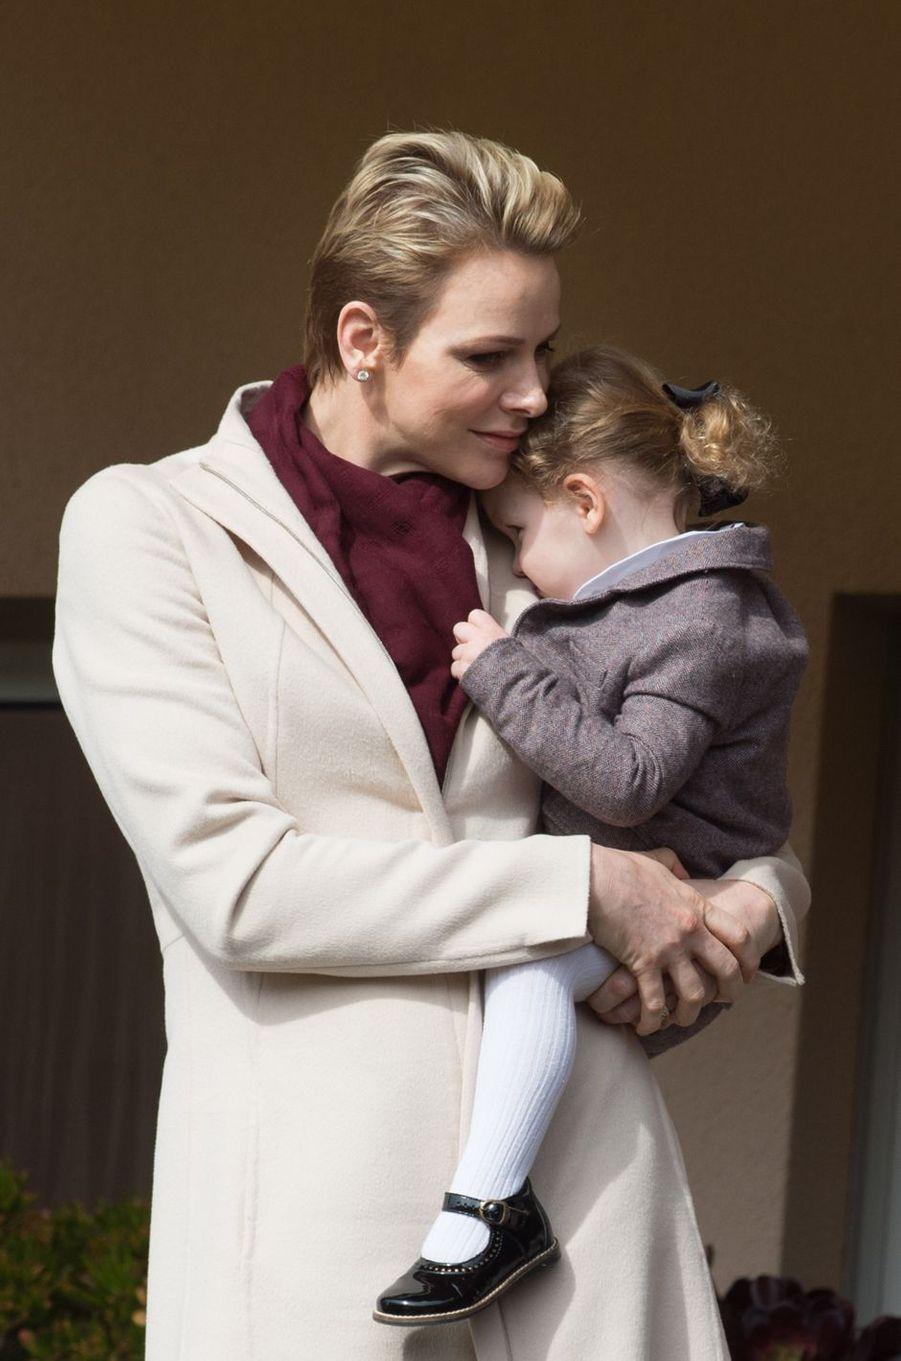 La princesse Charlène de Monaco avec sa fille la princesse Gabriella, le 18 mars 2017